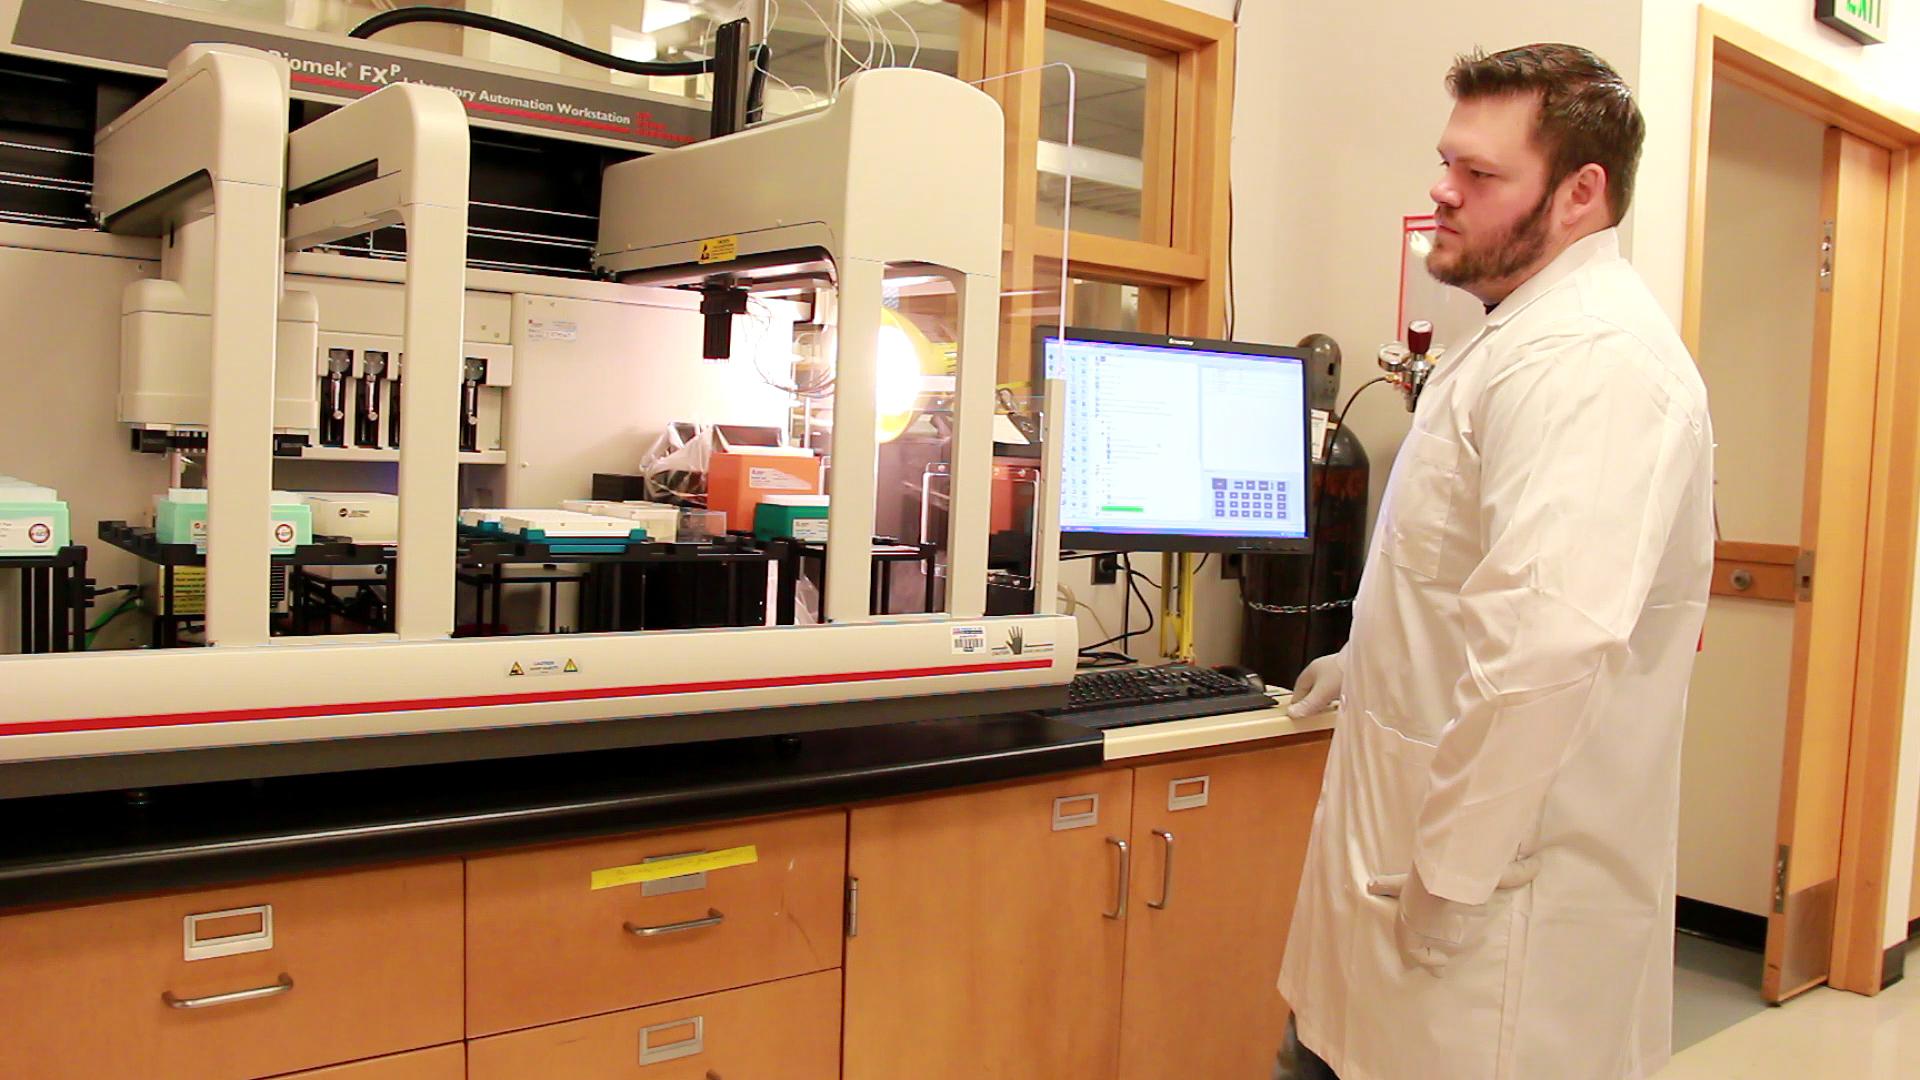 Chris Williams Microbiology Robotics University of Washington